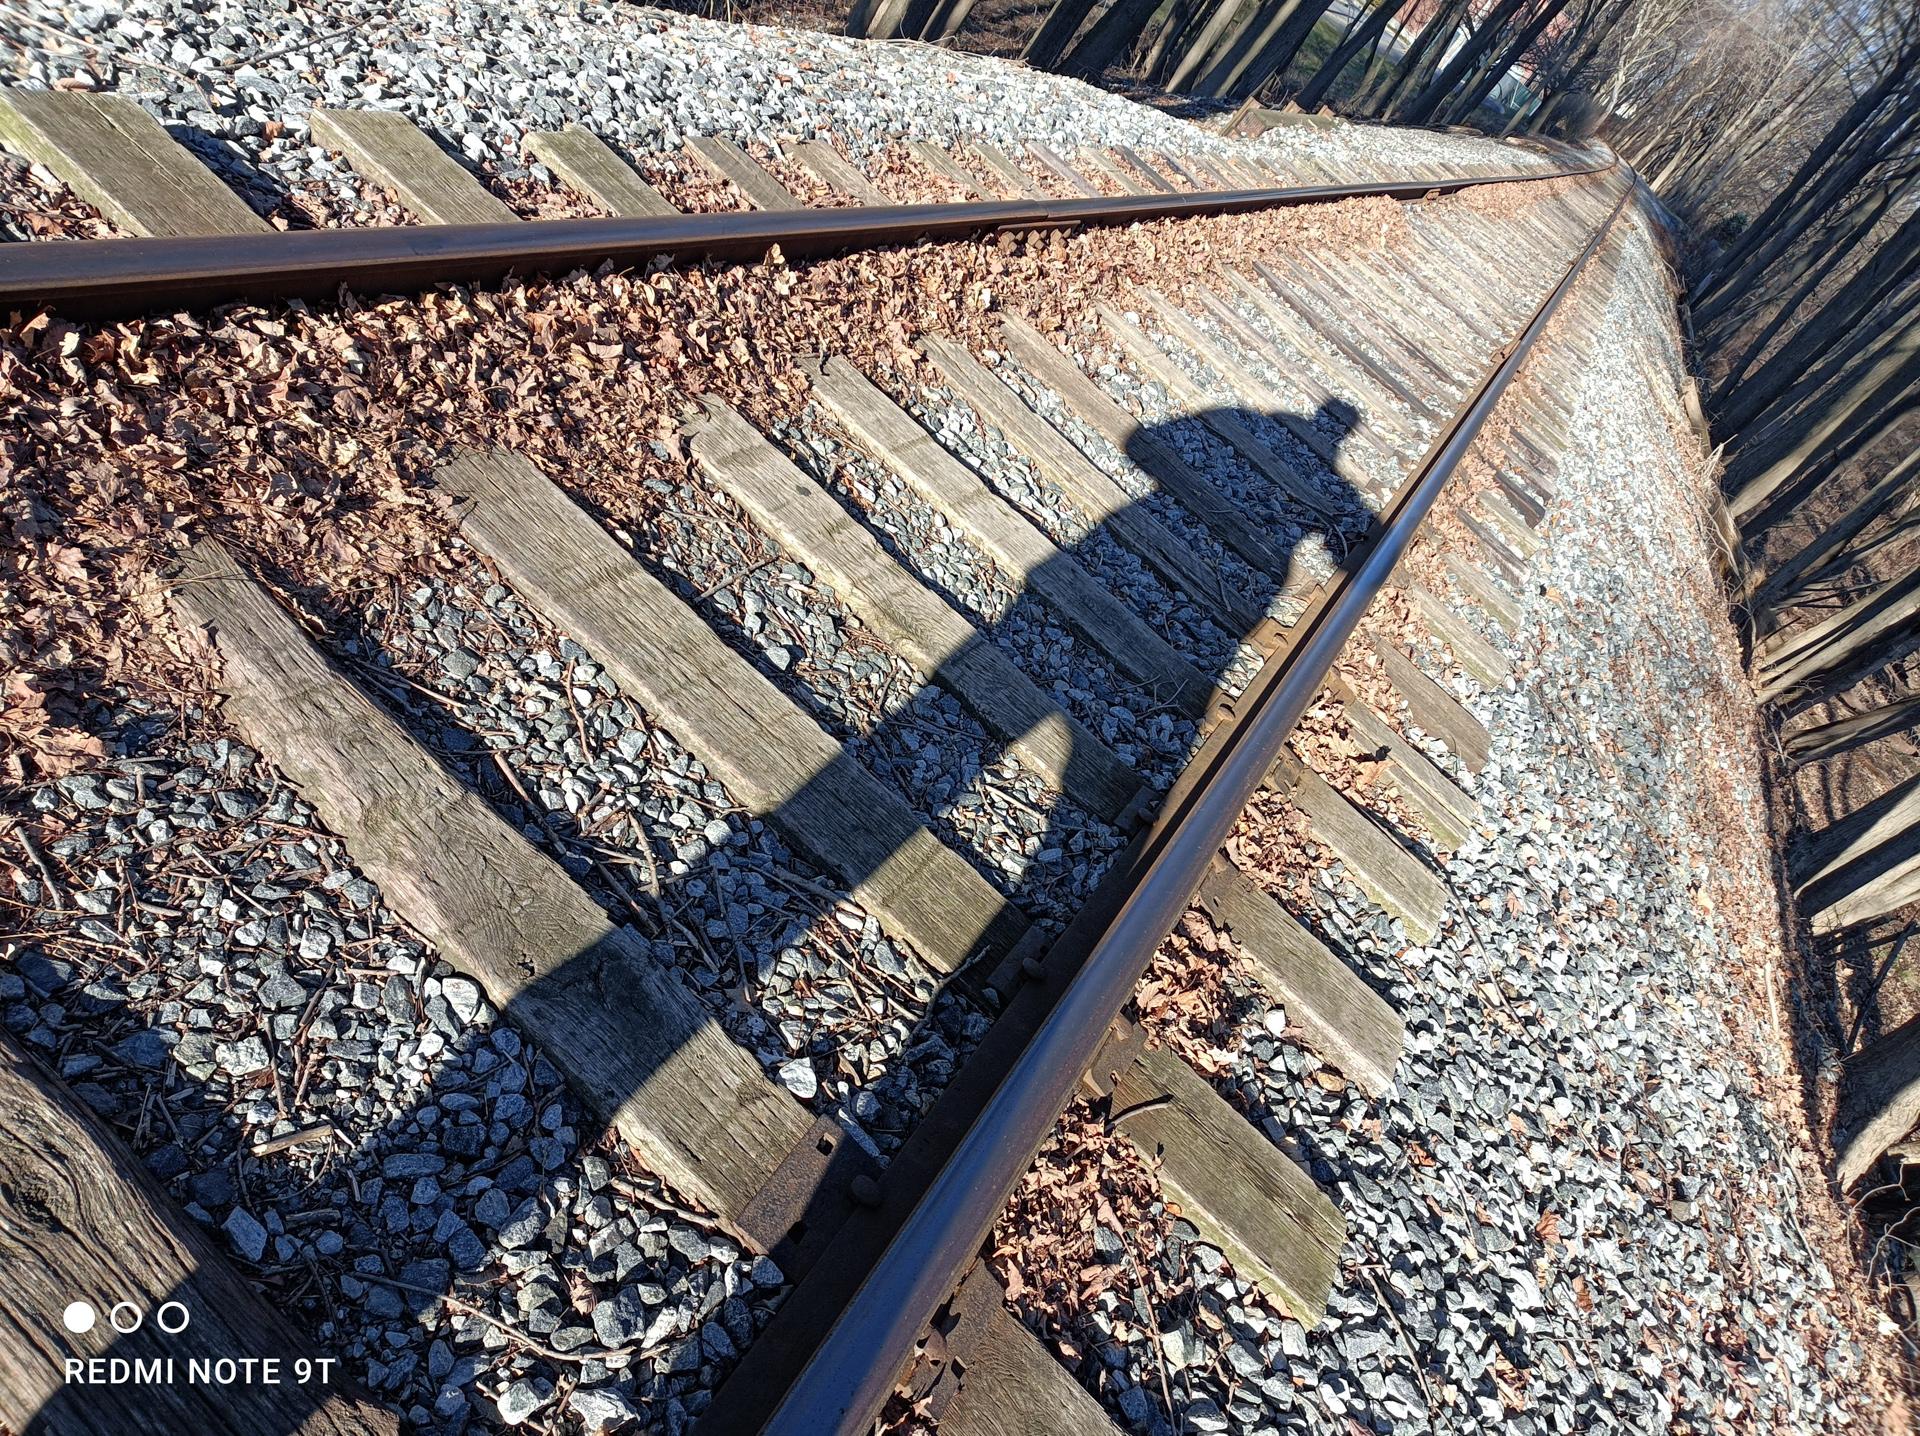 Xiaomi Redmi Note 9T photo sample shadow